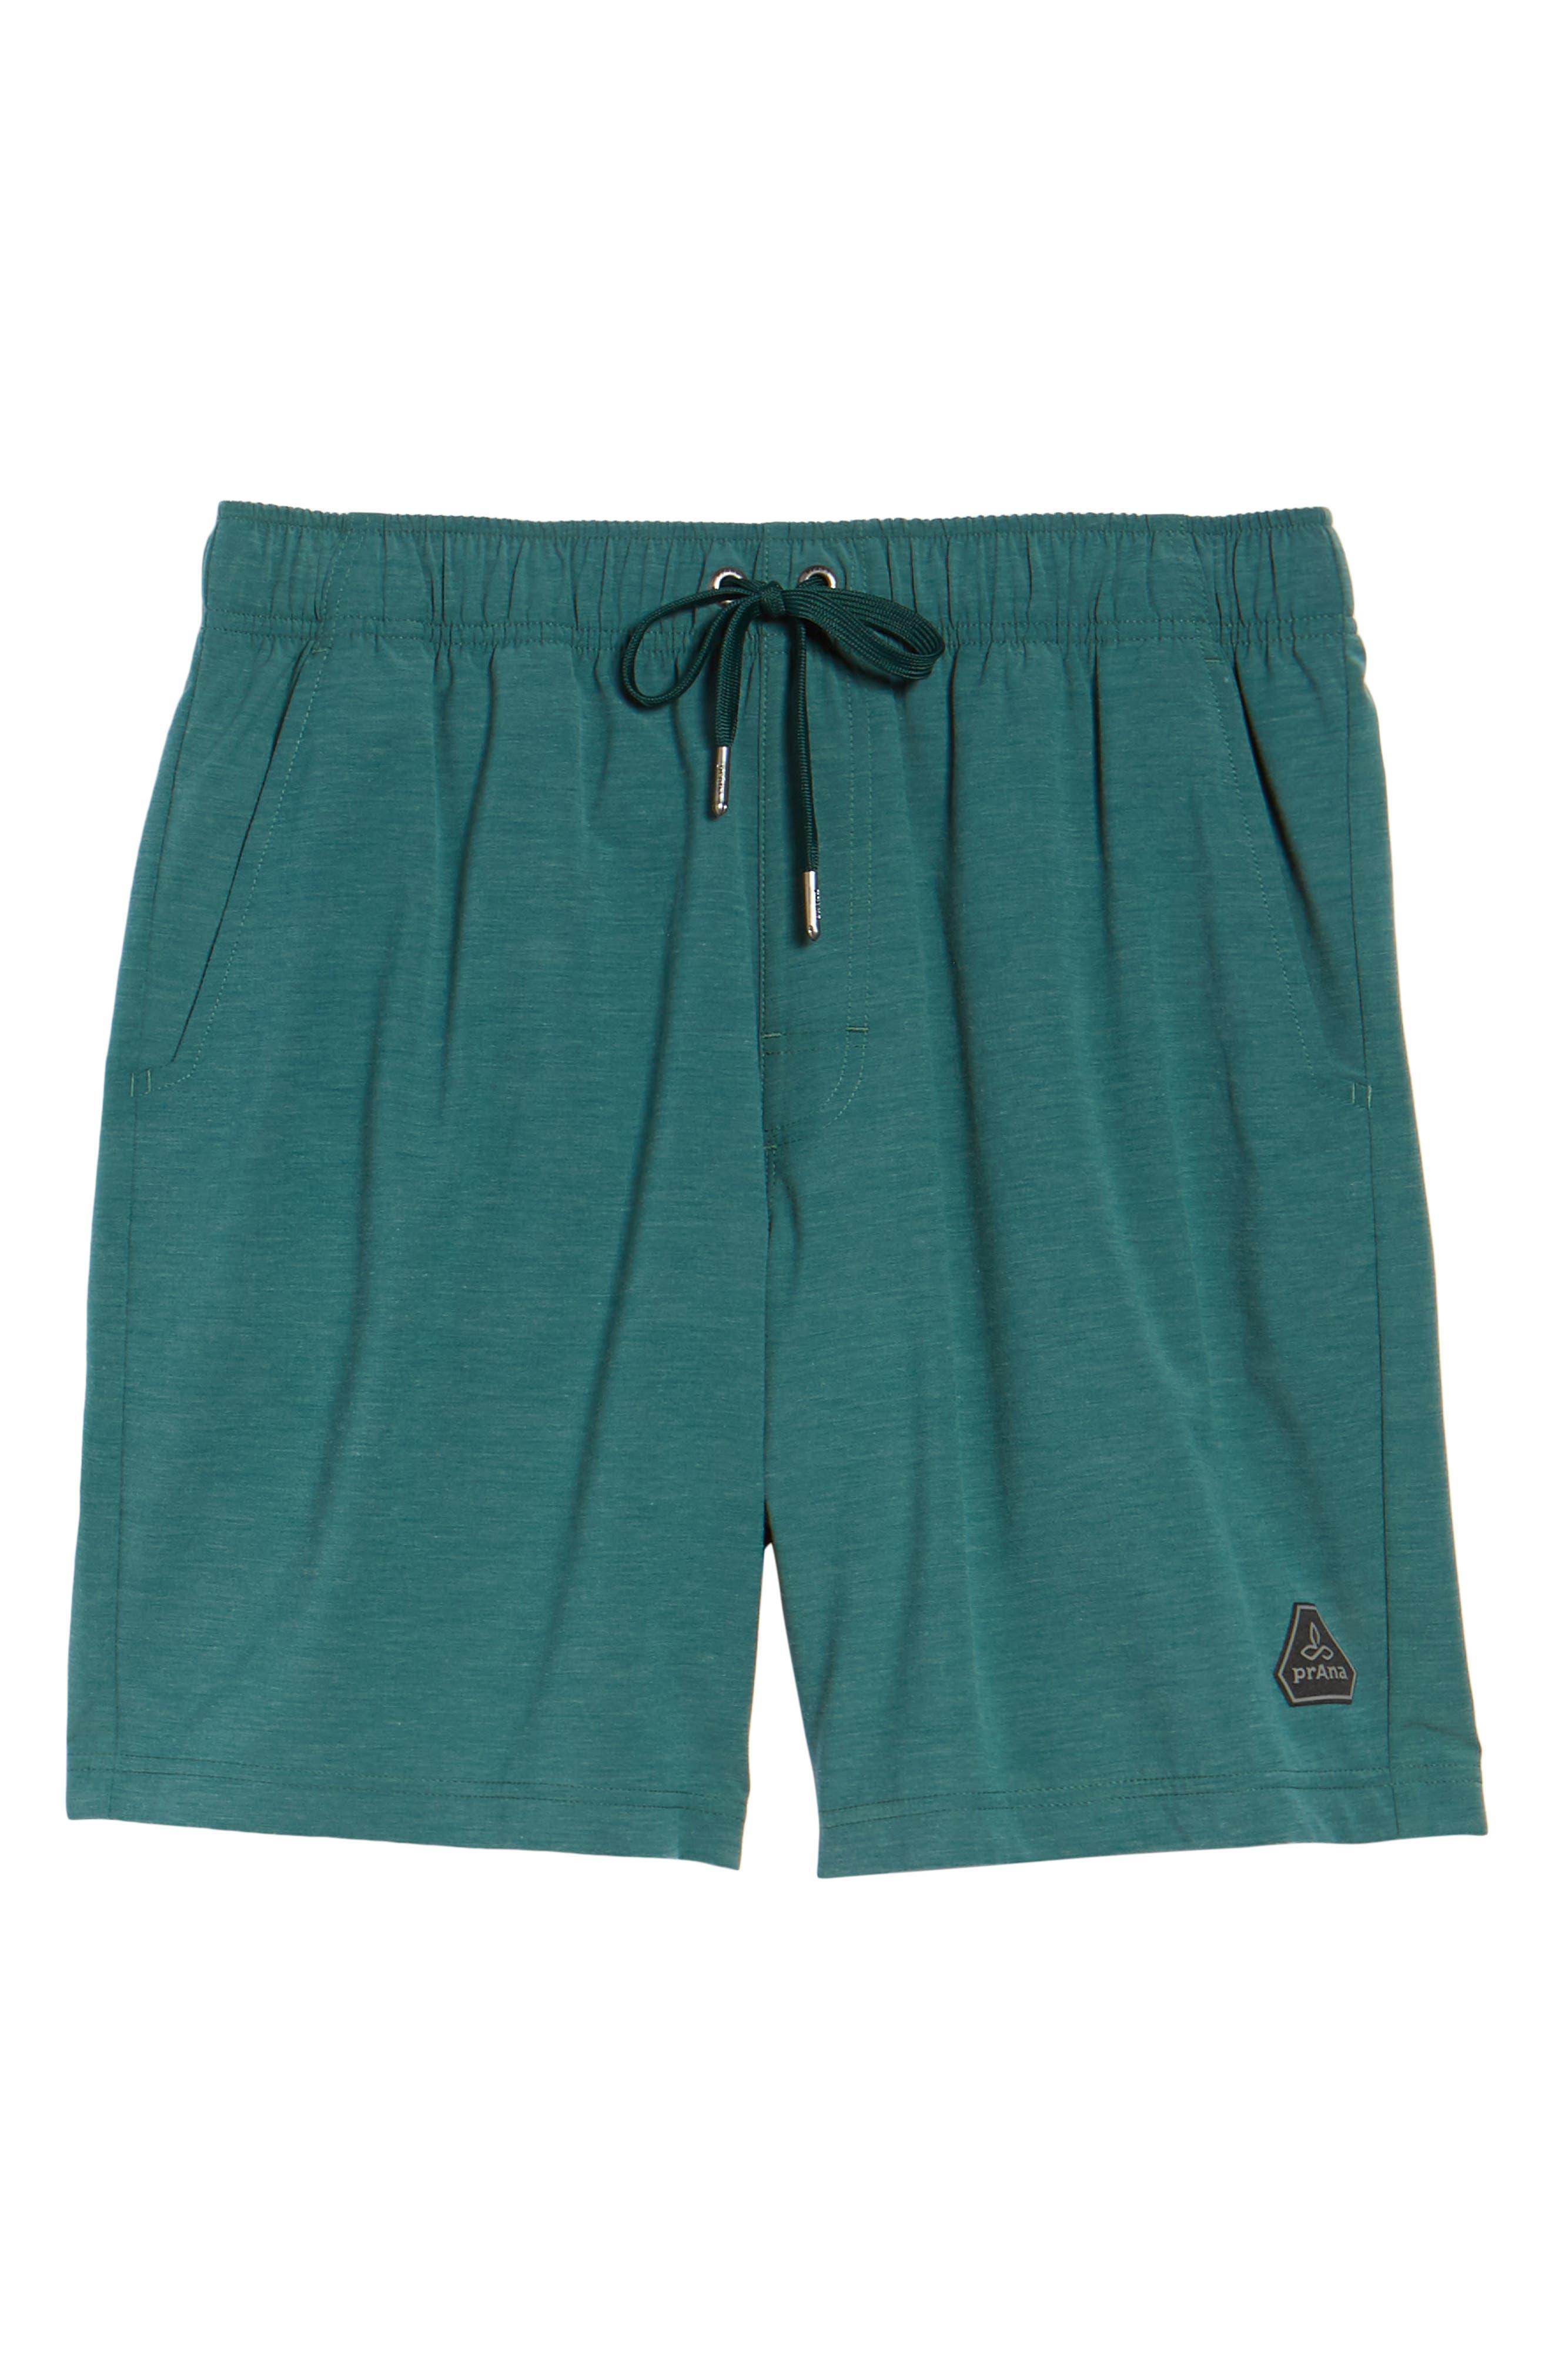 Metric Board Shorts,                             Alternate thumbnail 6, color,                             300